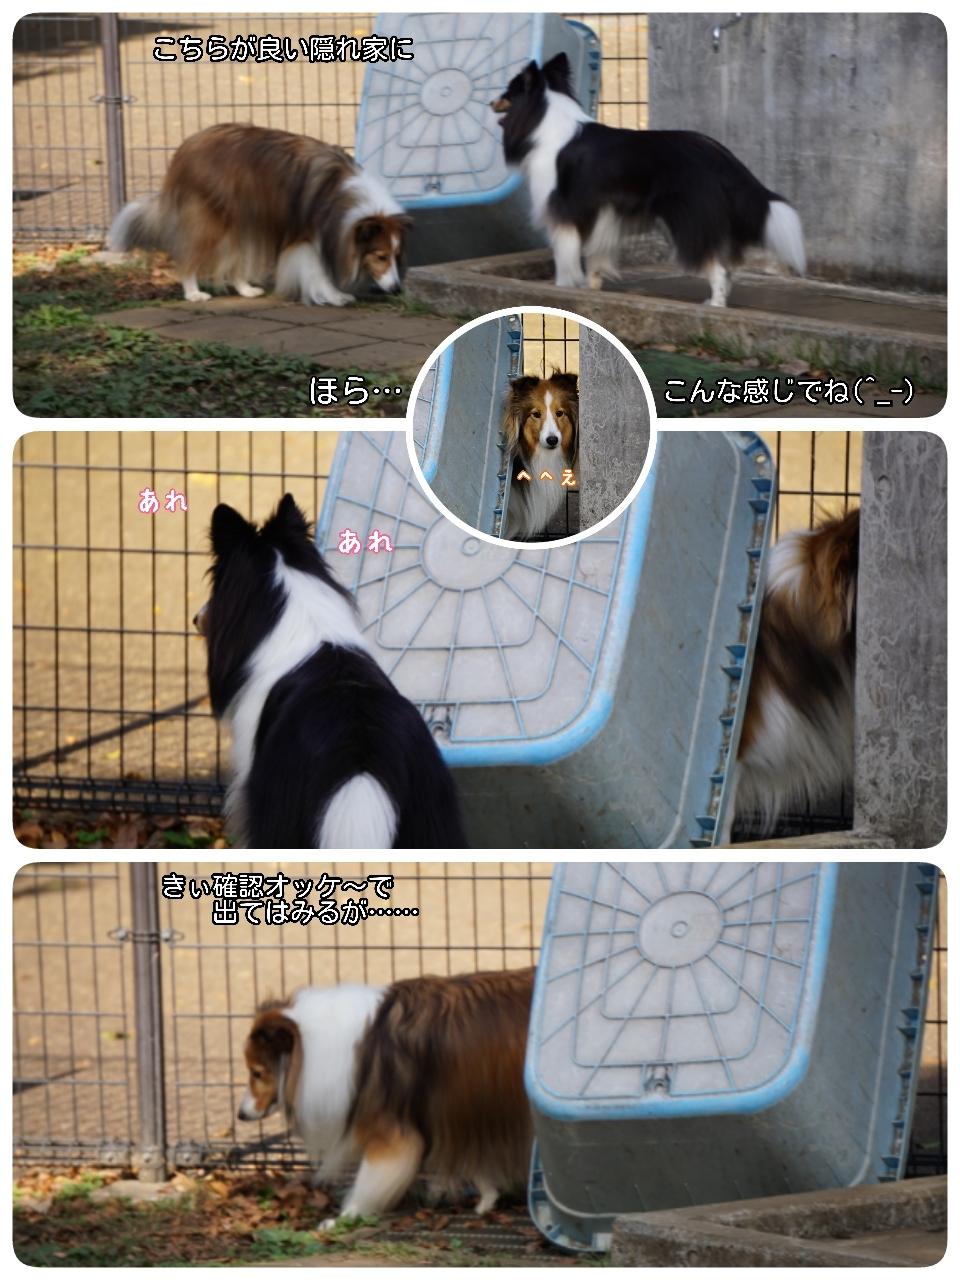 16-11-06-13-40-07-072_deco.jpg